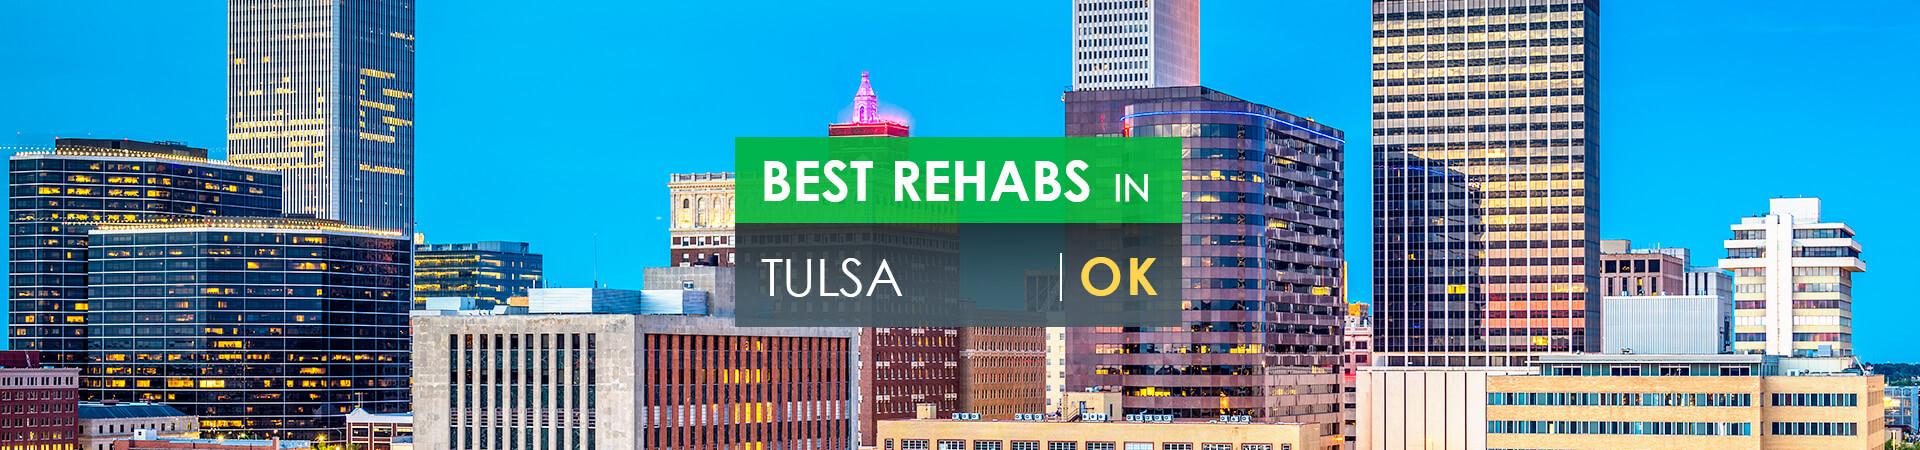 Best rehabs in Tulsa, OK